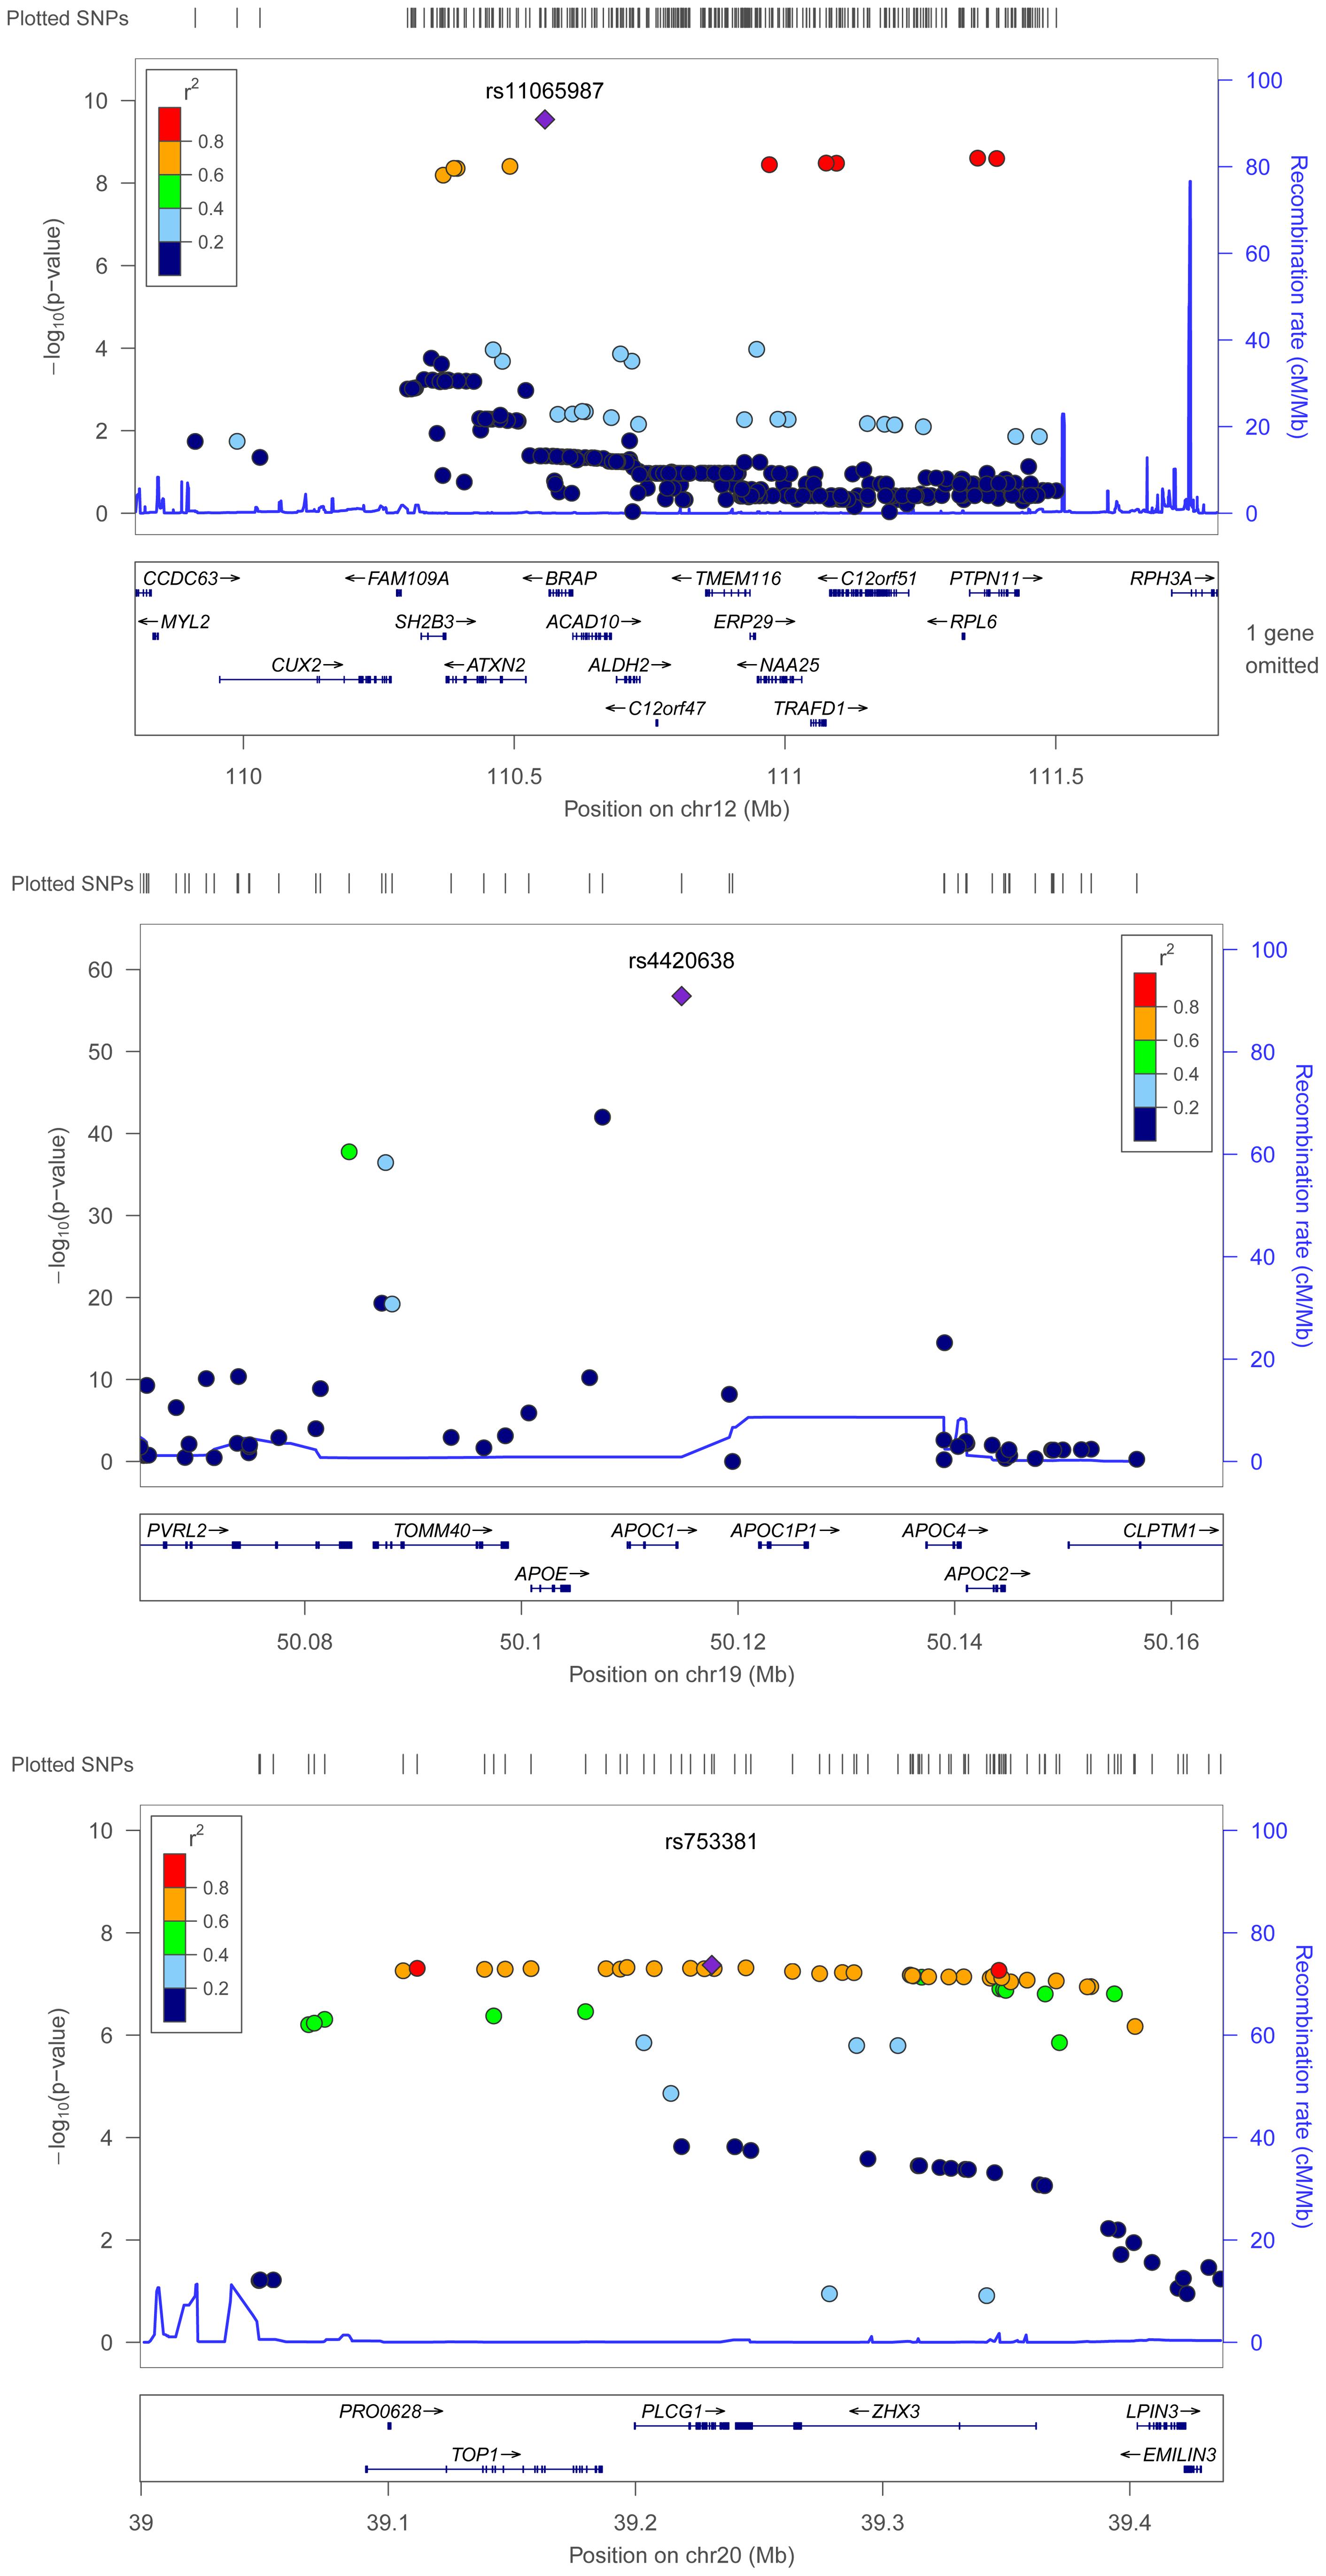 Regional association plots for metabolic syndrome trait dimensions associated with <i>APOC1</i>, <i>BRAP</i>, and <i>PLCG1</i>.